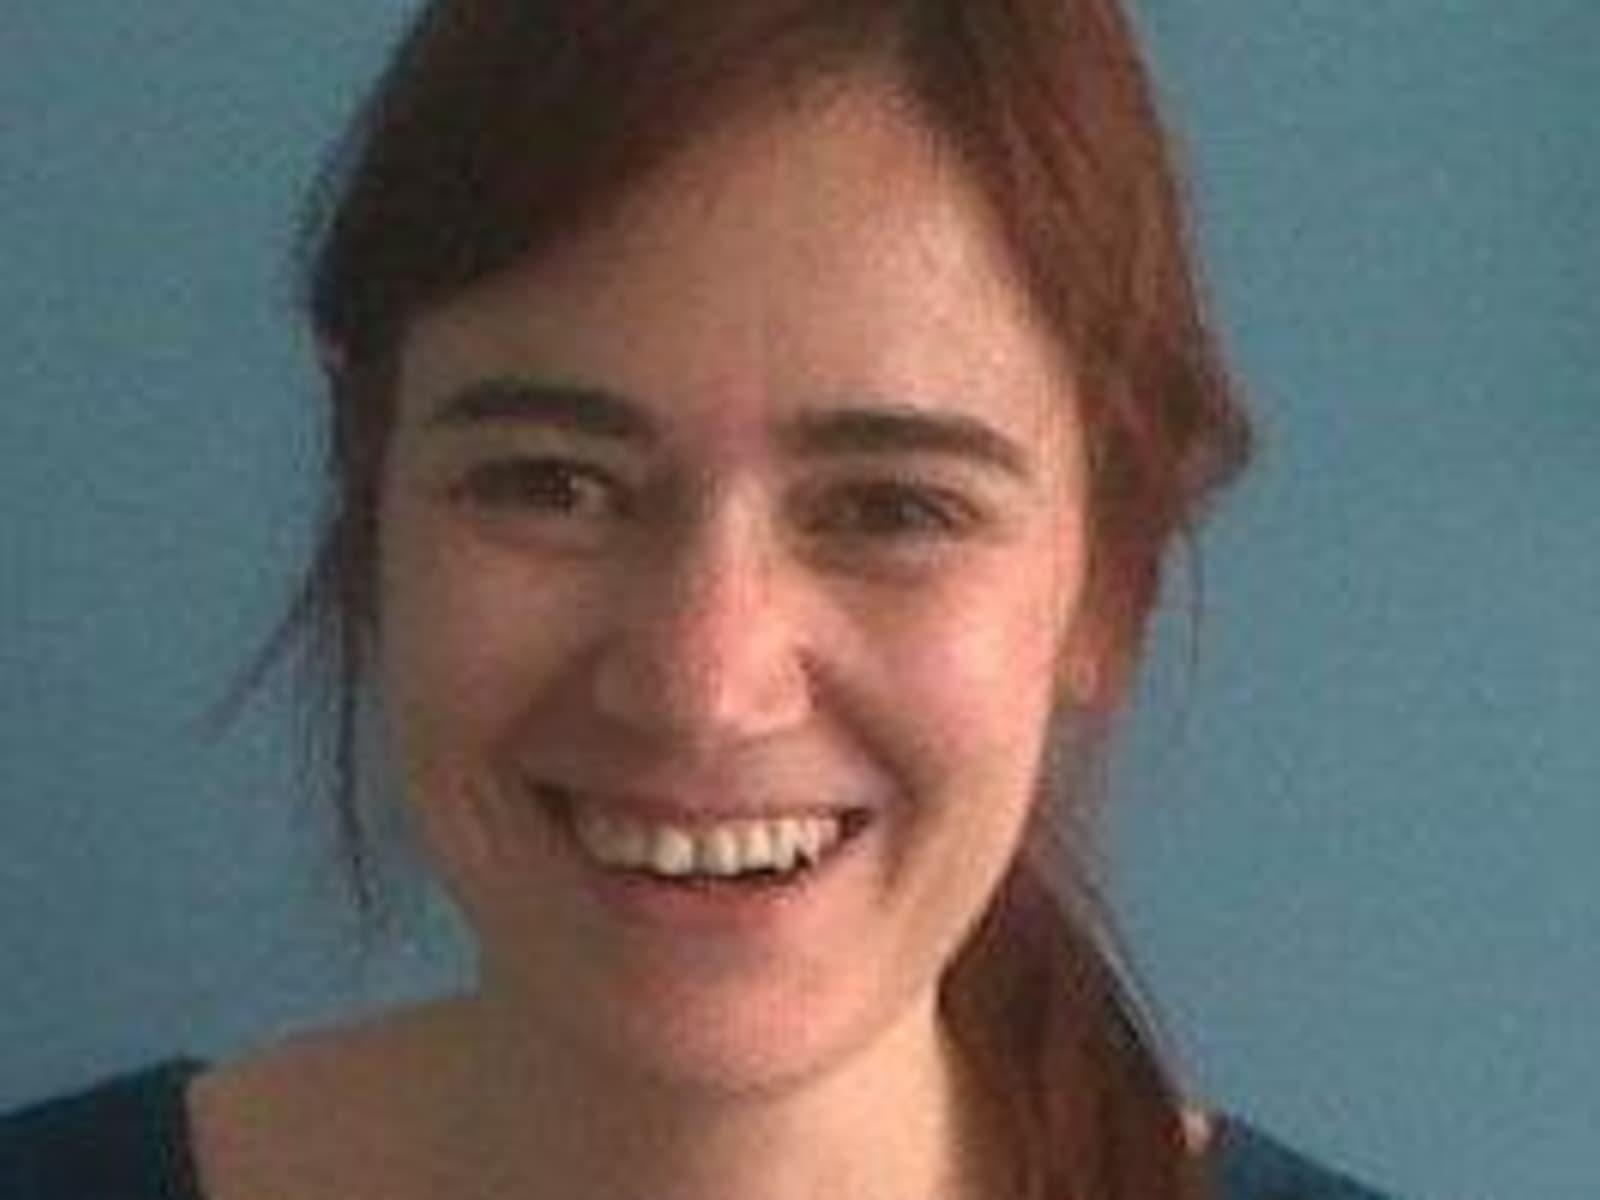 Claudia from London, United Kingdom